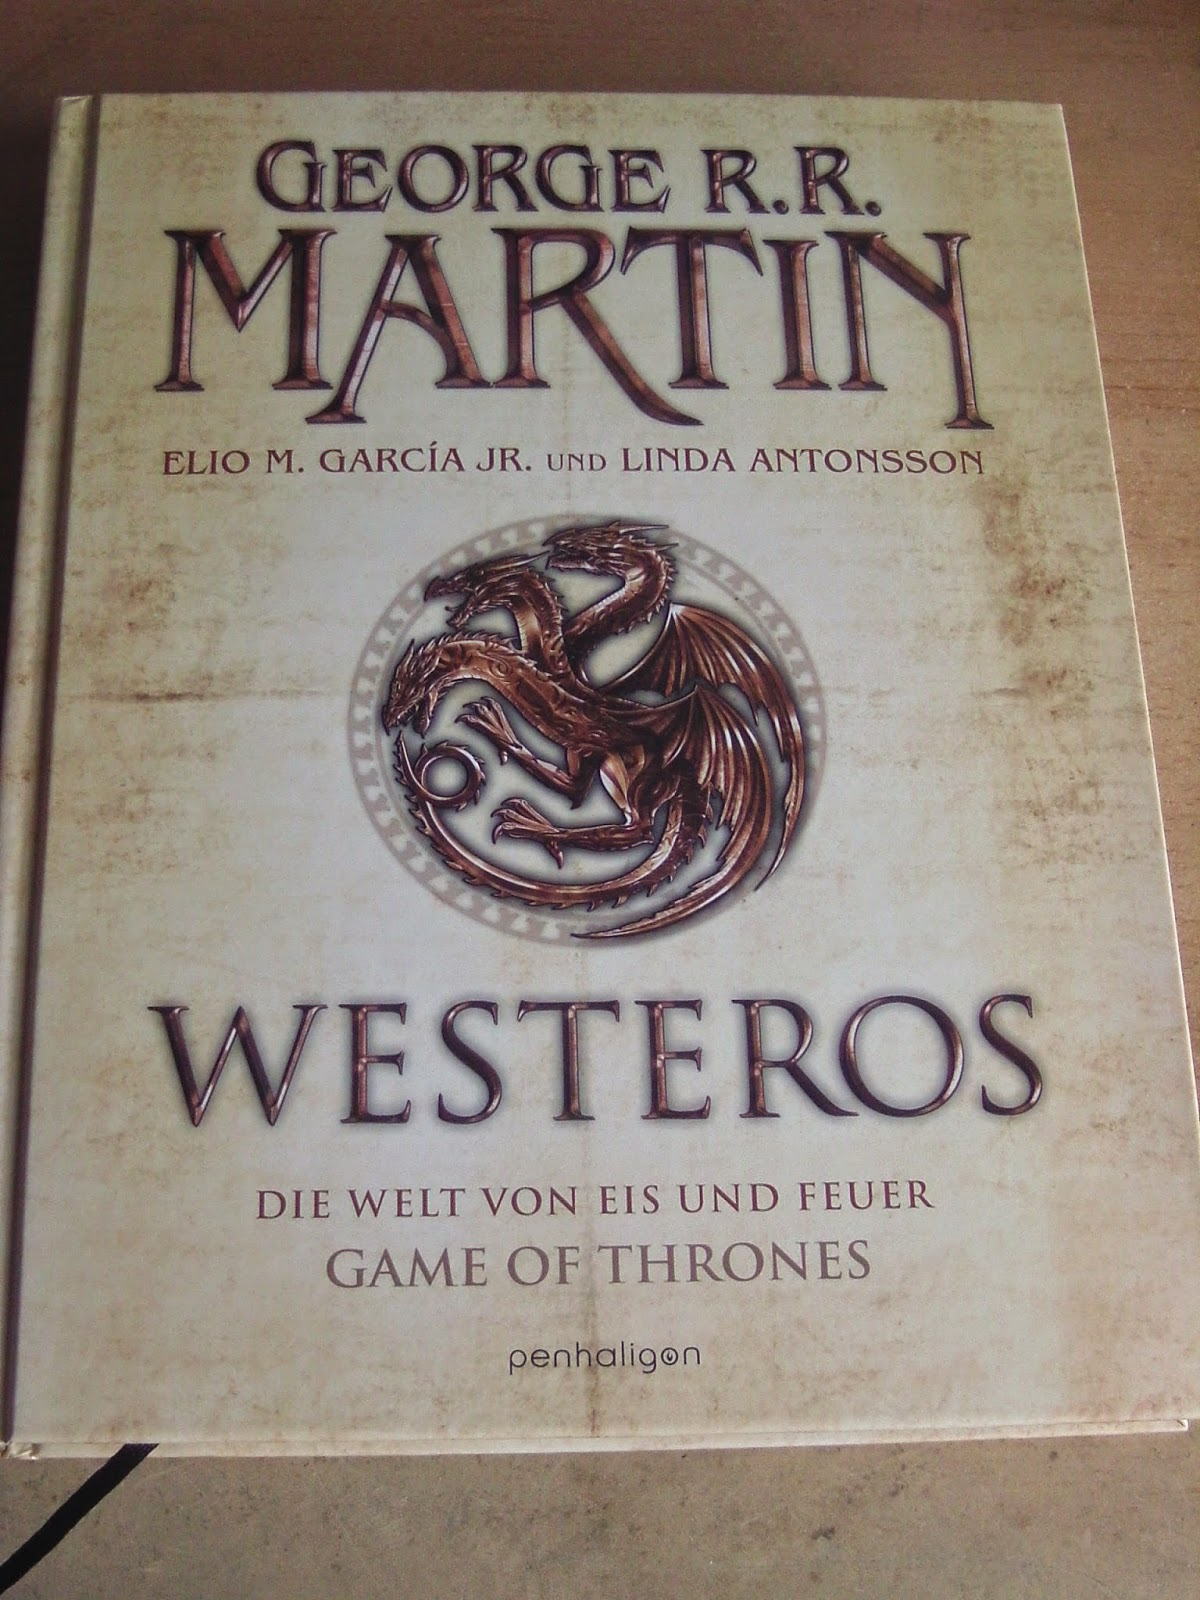 http://www.amazon.de/Westeros-Welt-Feuer-THRONES-Bildband/dp/3764531363/ref=sr_1_1?ie=UTF8&qid=1429121031&sr=8-1&keywords=westeros